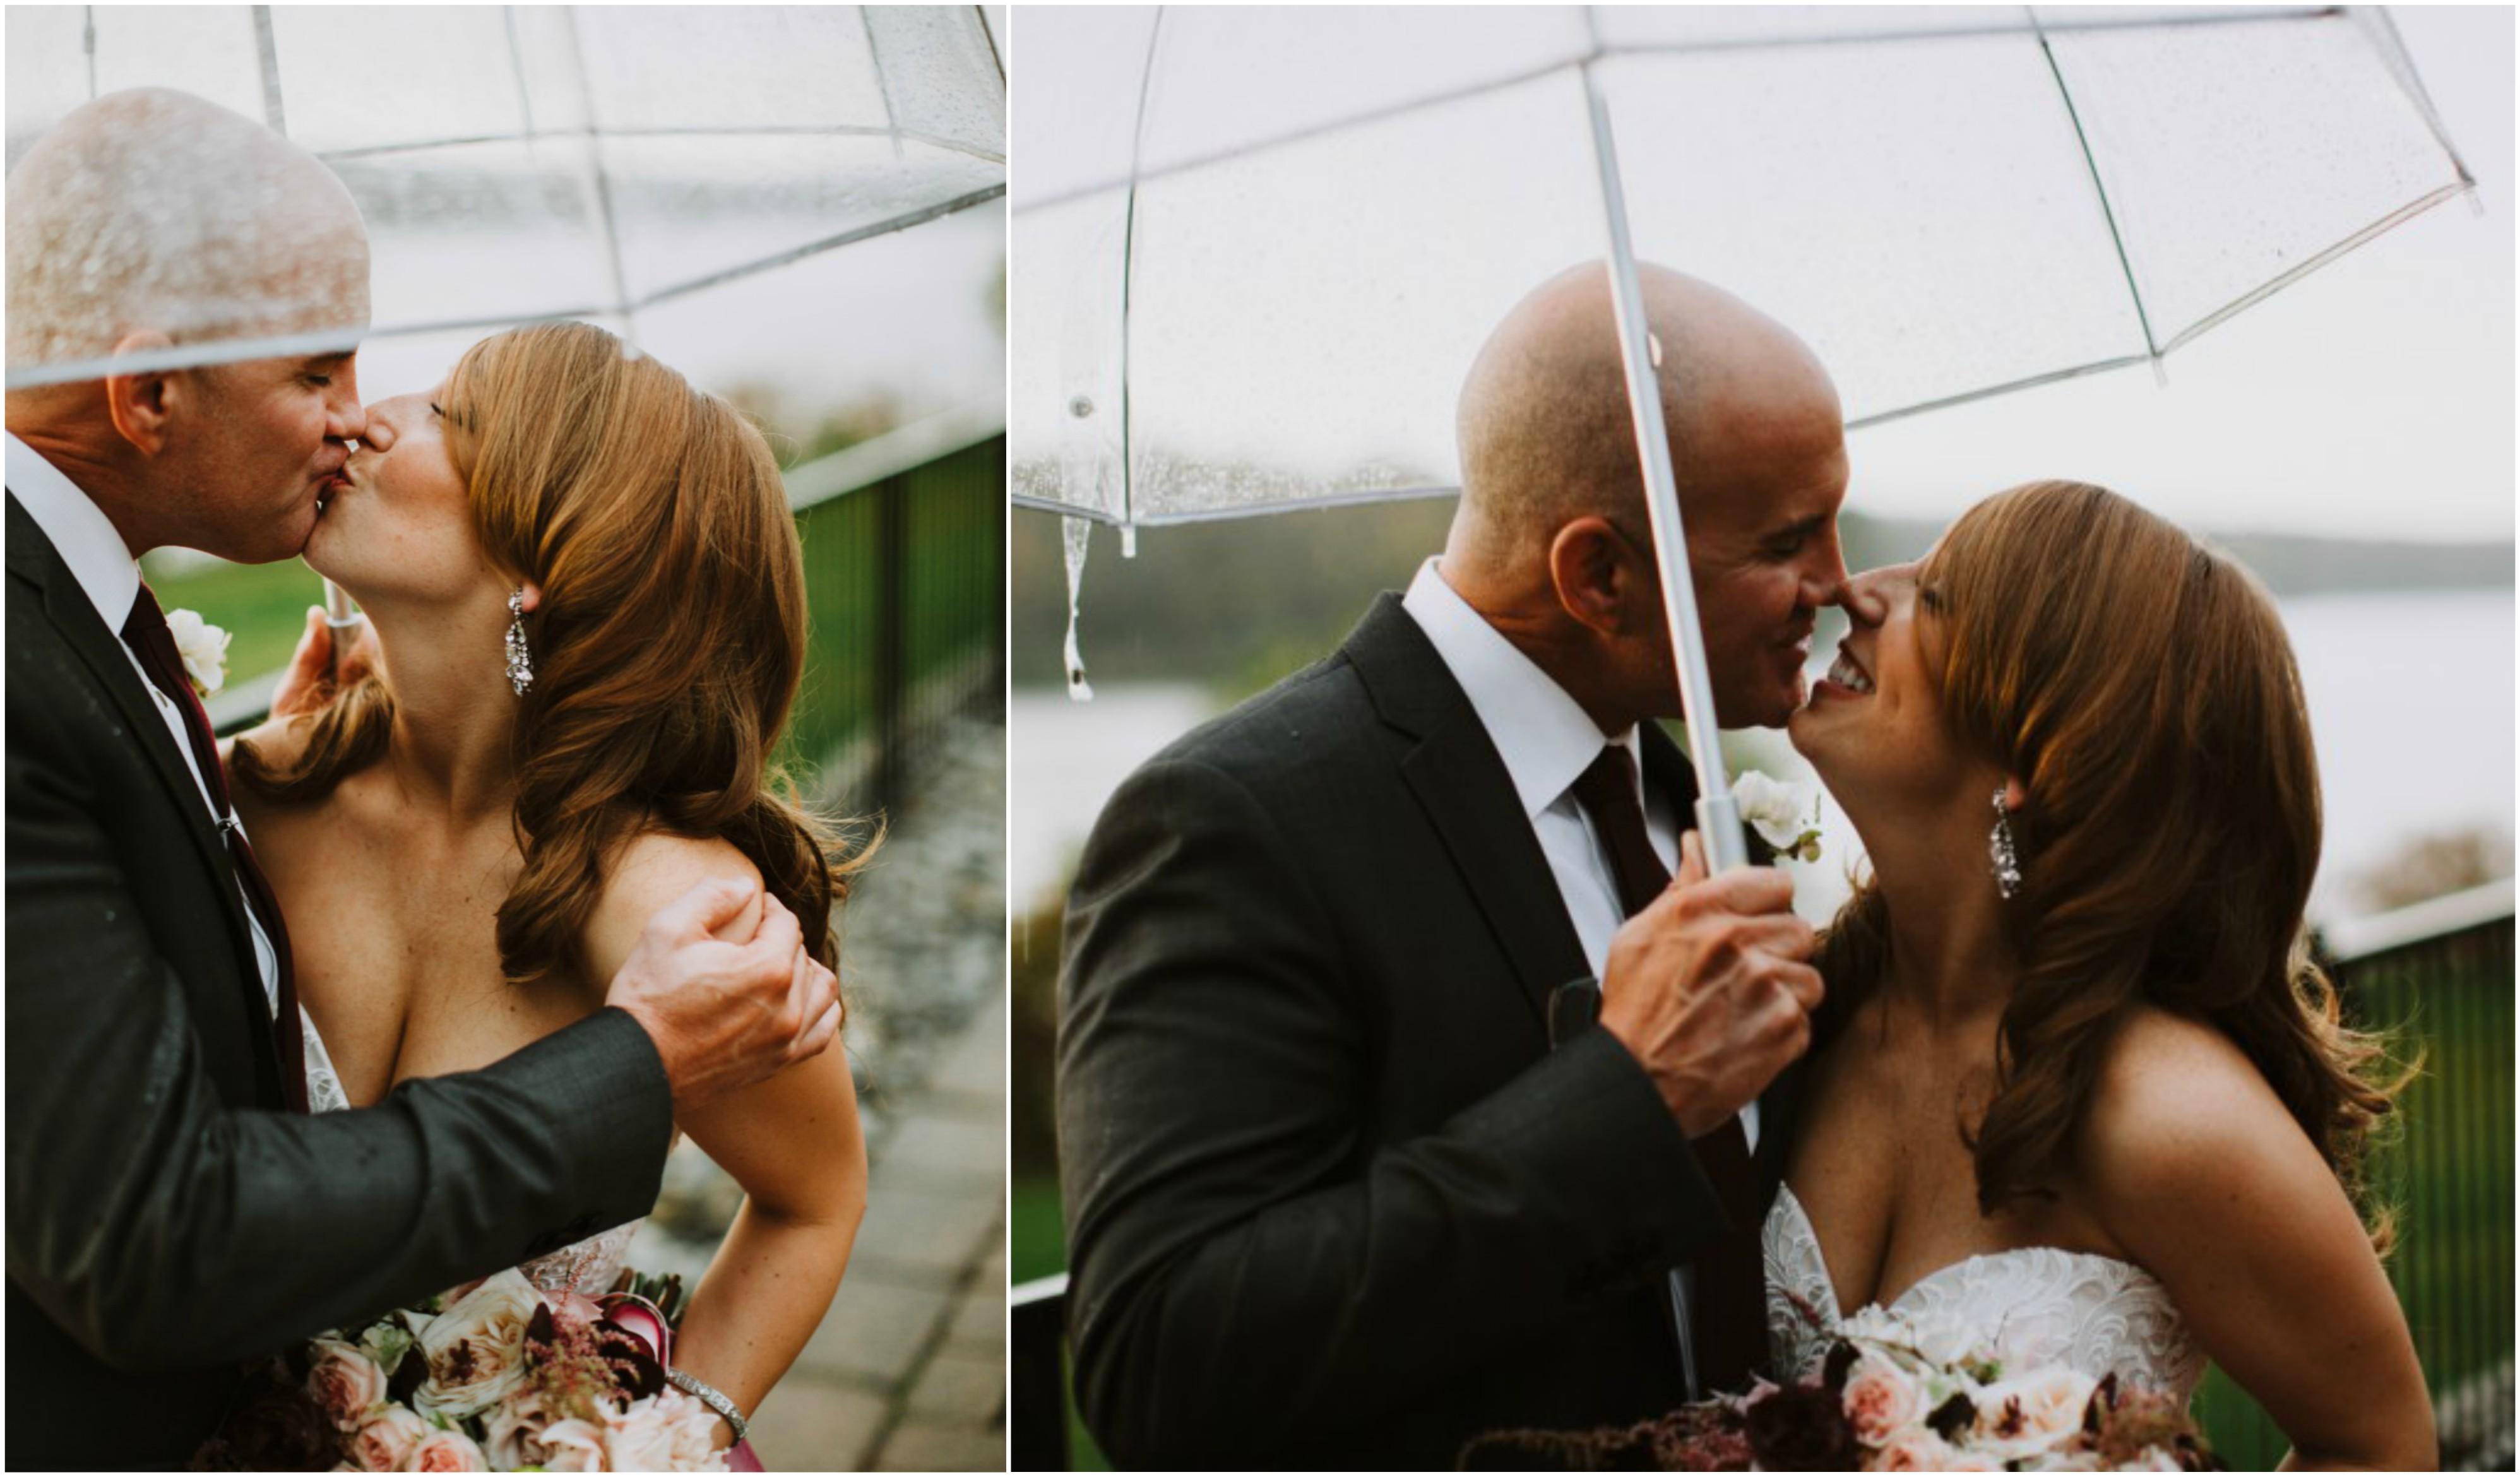 The Lake House Inn Wedding Venue Philly In Love Philadelphia Weddings4